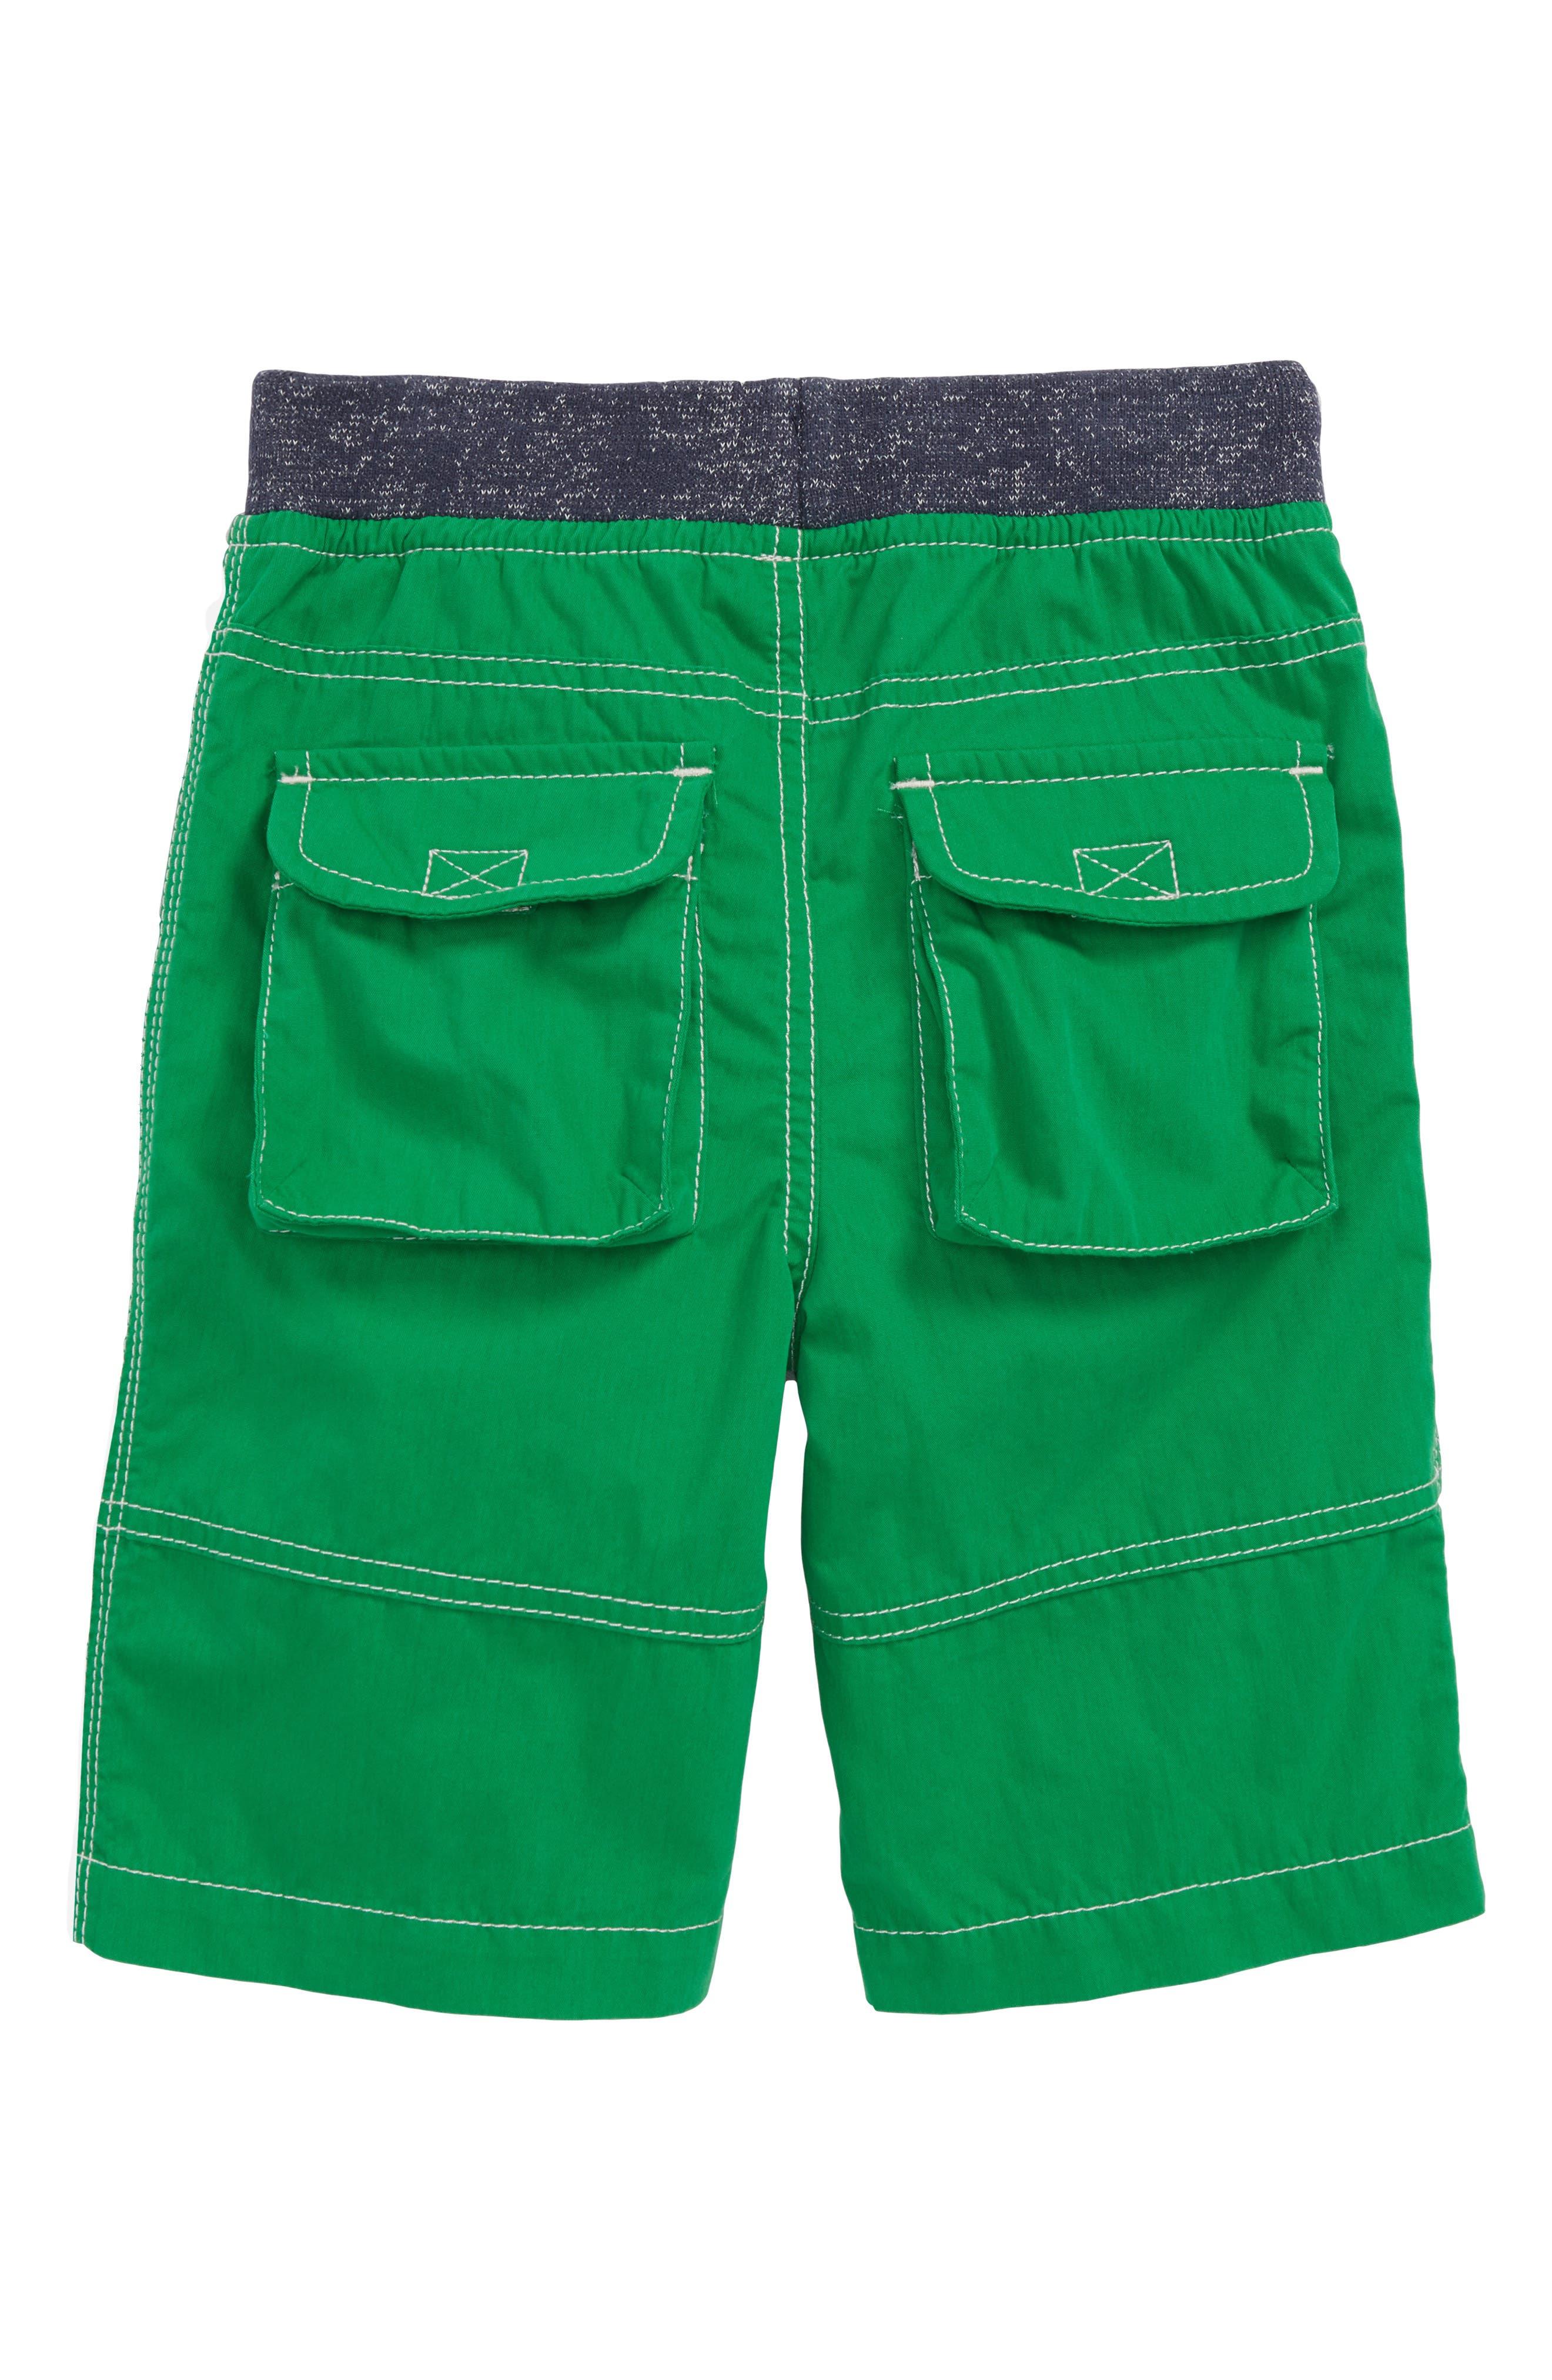 Adventure Shorts,                             Alternate thumbnail 3, color,                             Runner Bean Green